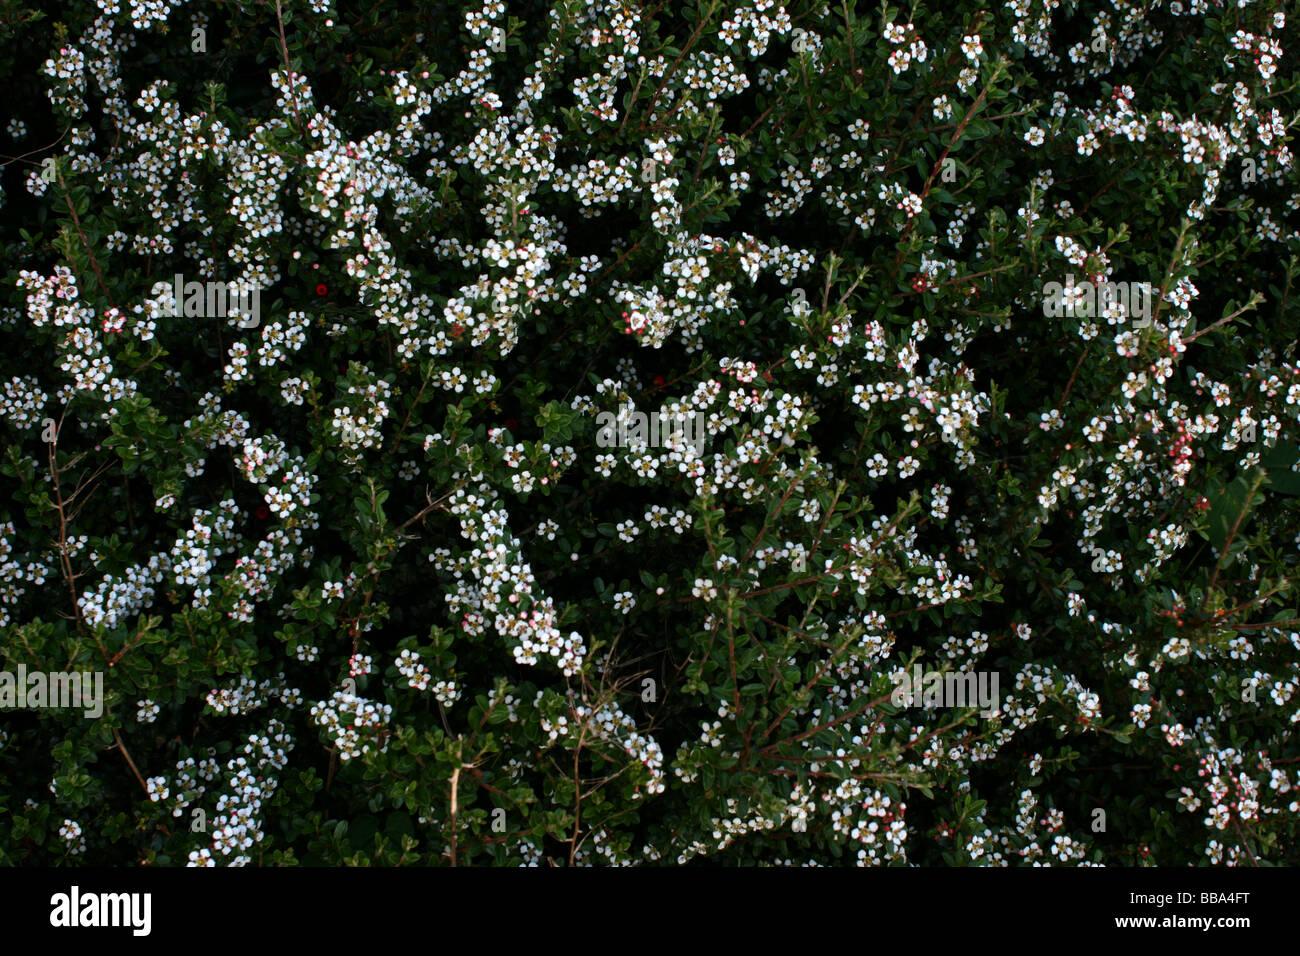 Bush small white flowers on stock photos bush small white flowers white flowers on a bush stock image mightylinksfo Images